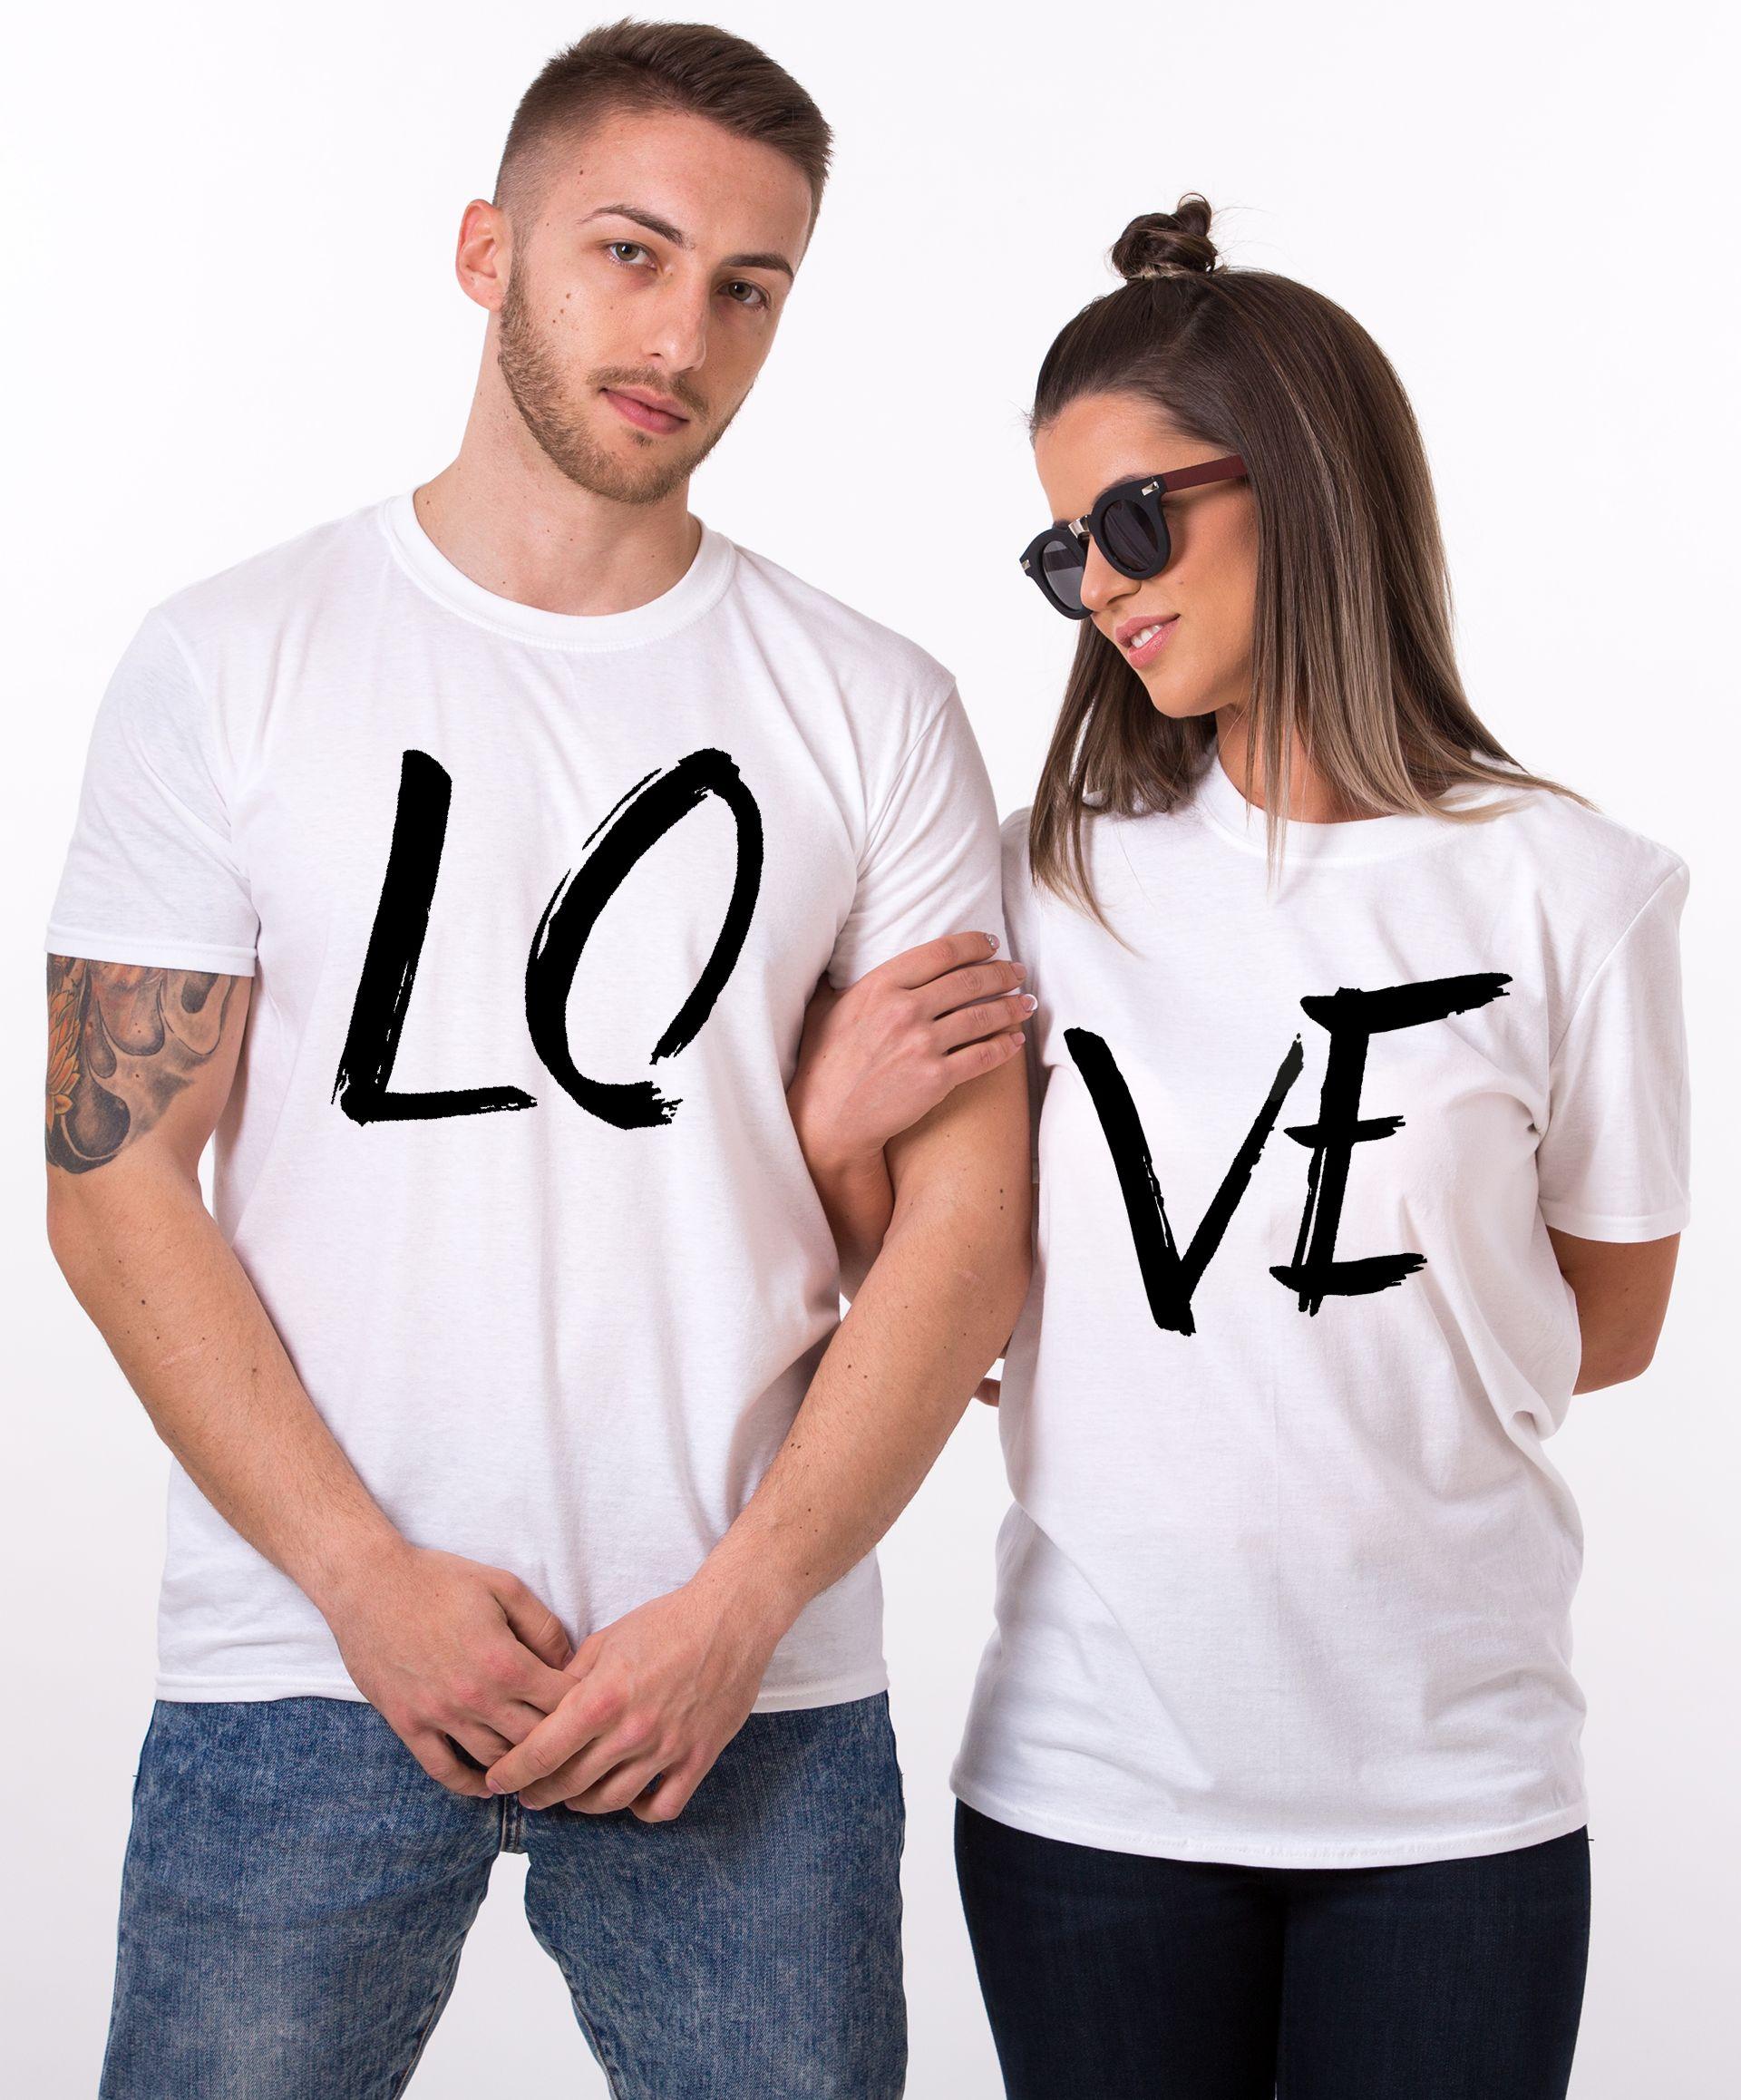 LOVE Couples Shirts Matching Couples Shirt Unisex